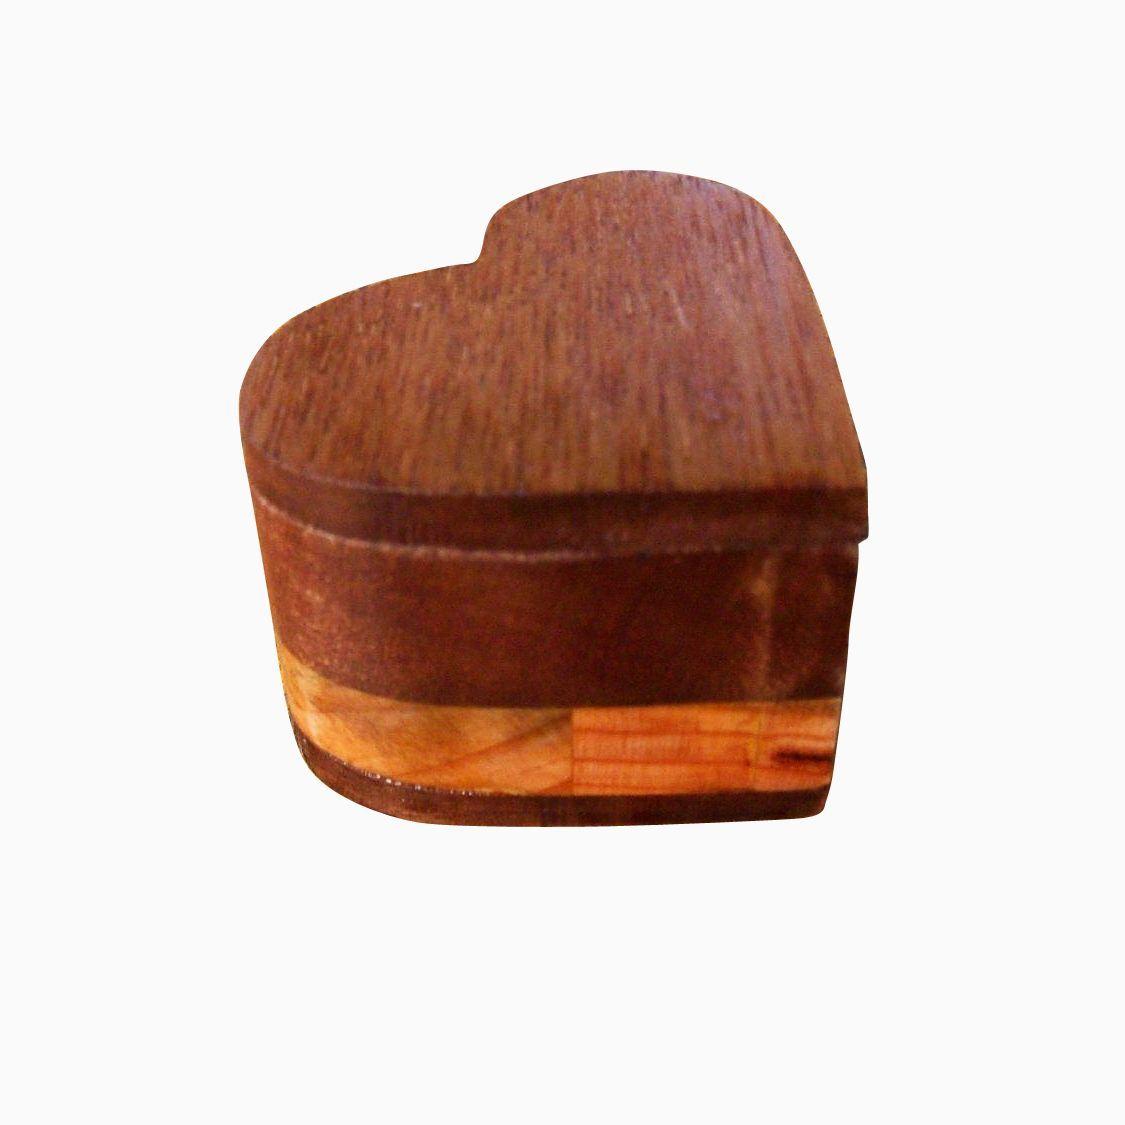 Custom Made Heart Shaped Wooden Ring Box Wooden Ring Box Wooden Rings Ring Box